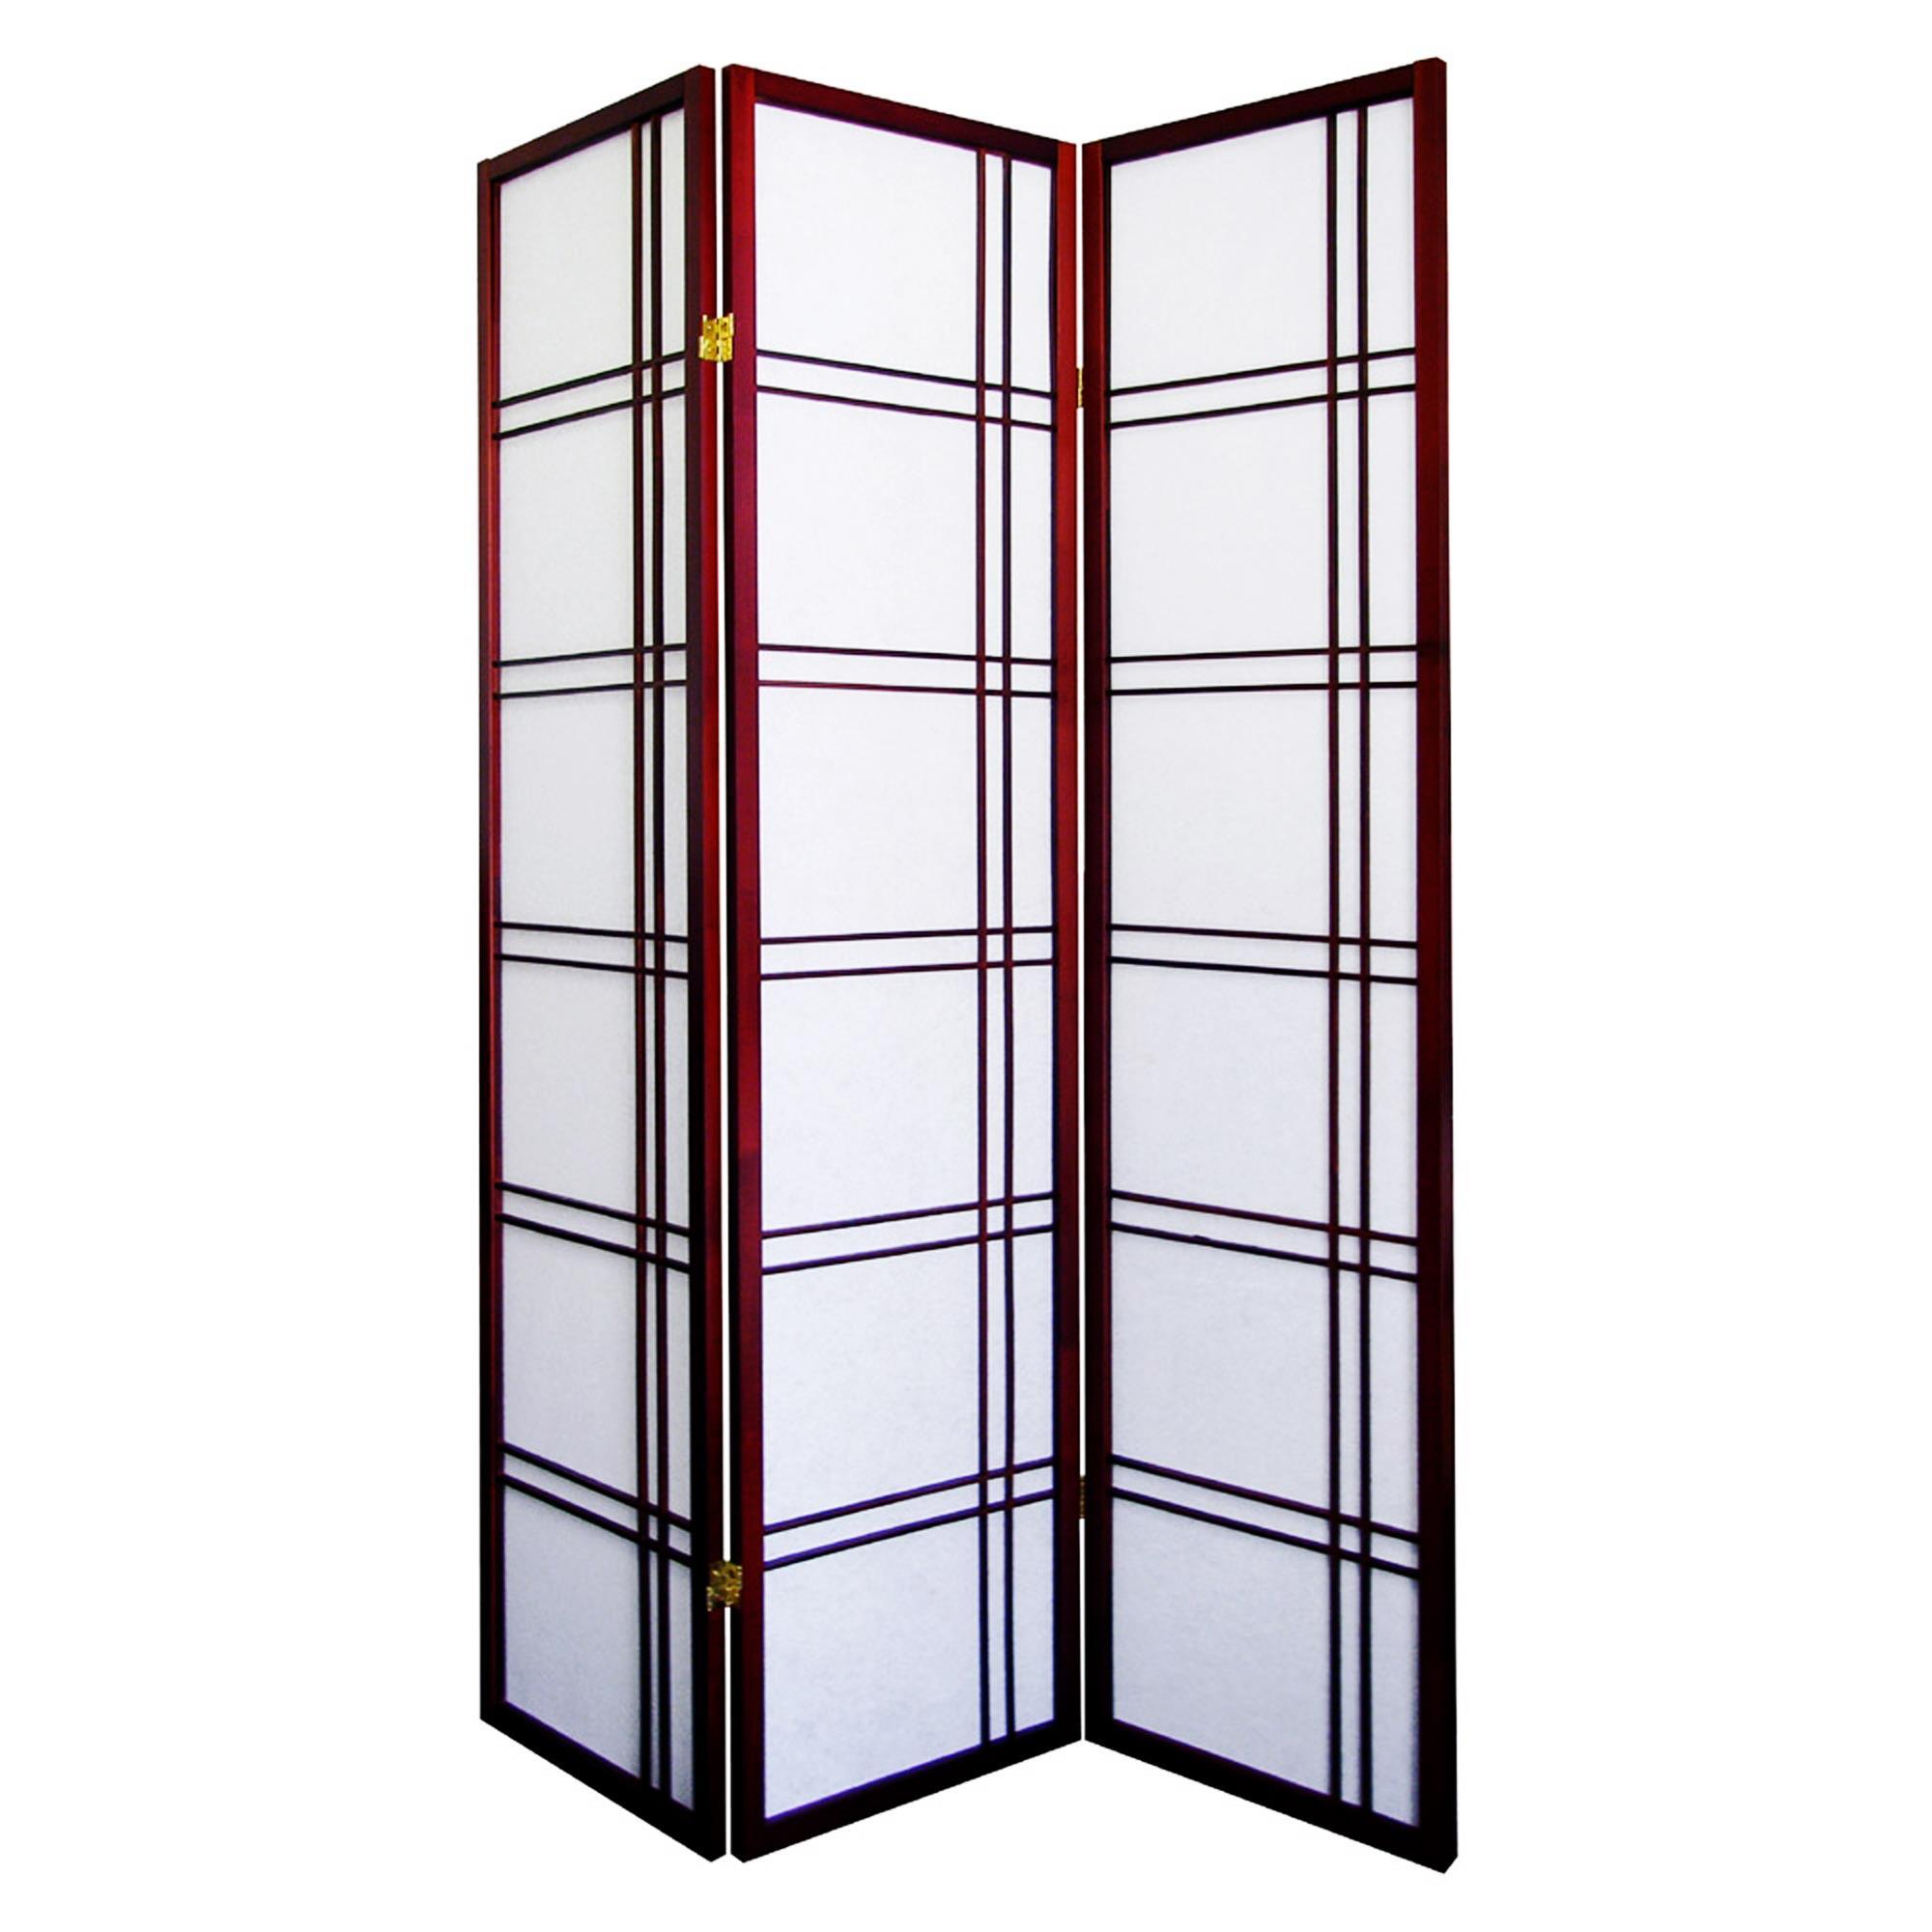 Ore international girard 3 panel room divider by oj commerce r542na - 3 panel screen room divider ...